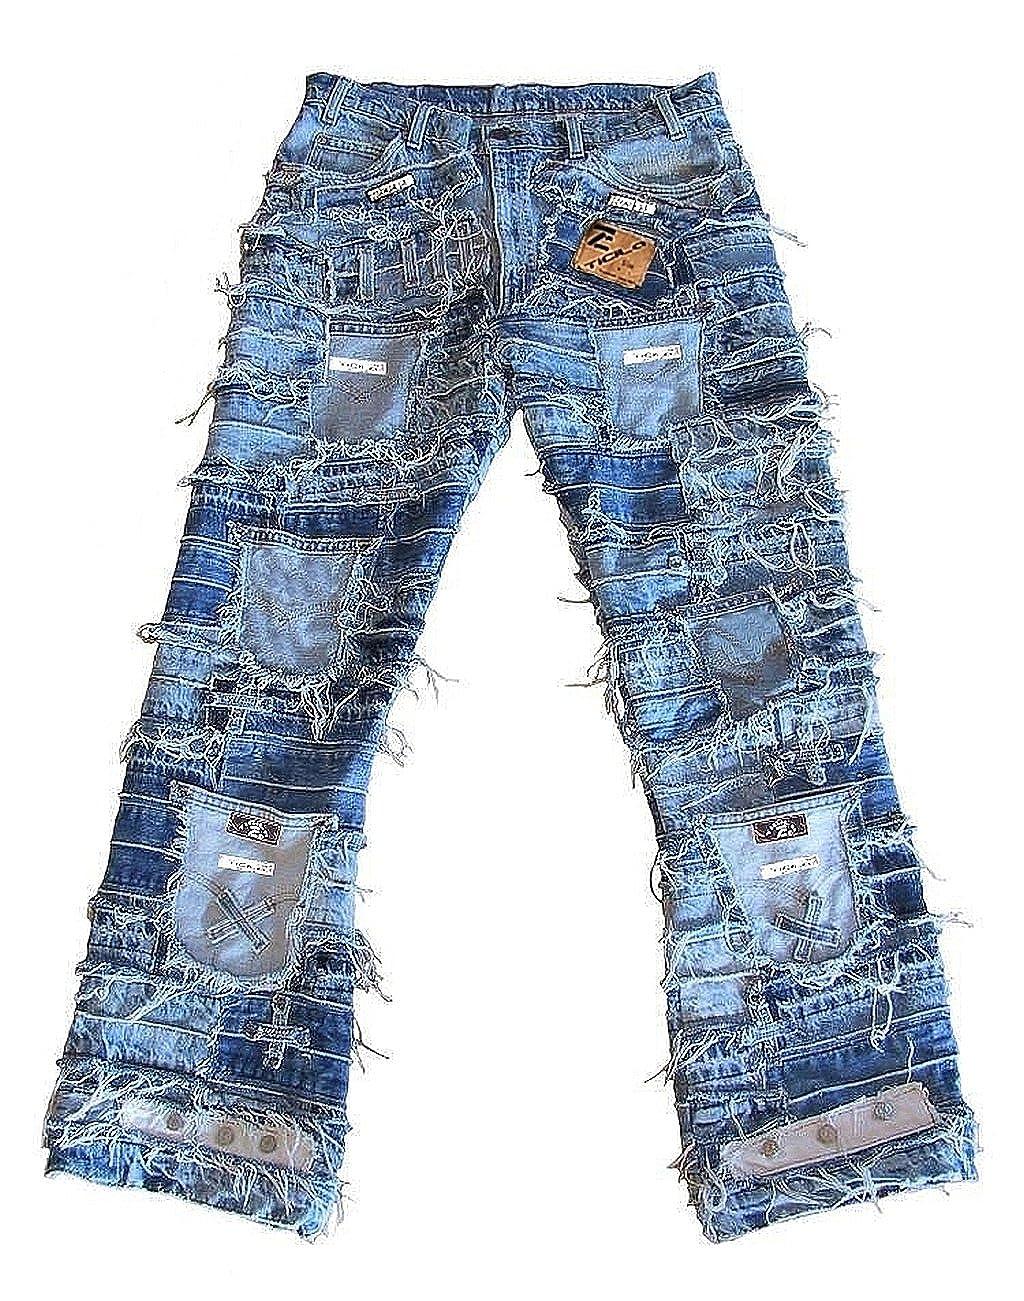 TICILA - - Jeans - Uomo 0215ad - amarjityoga.com 45bf063c2cf